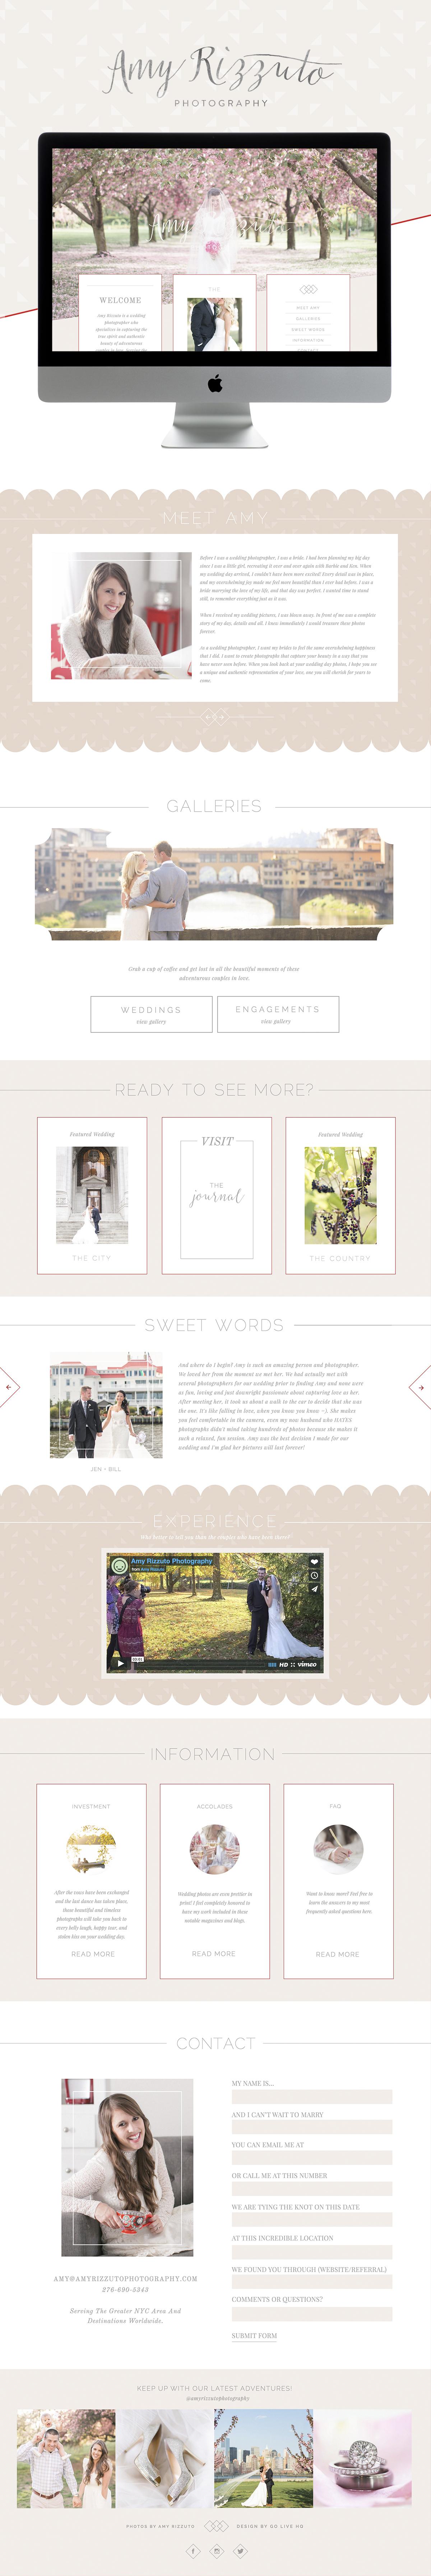 romantic modern showit photography website design | designed by: golivehq.co